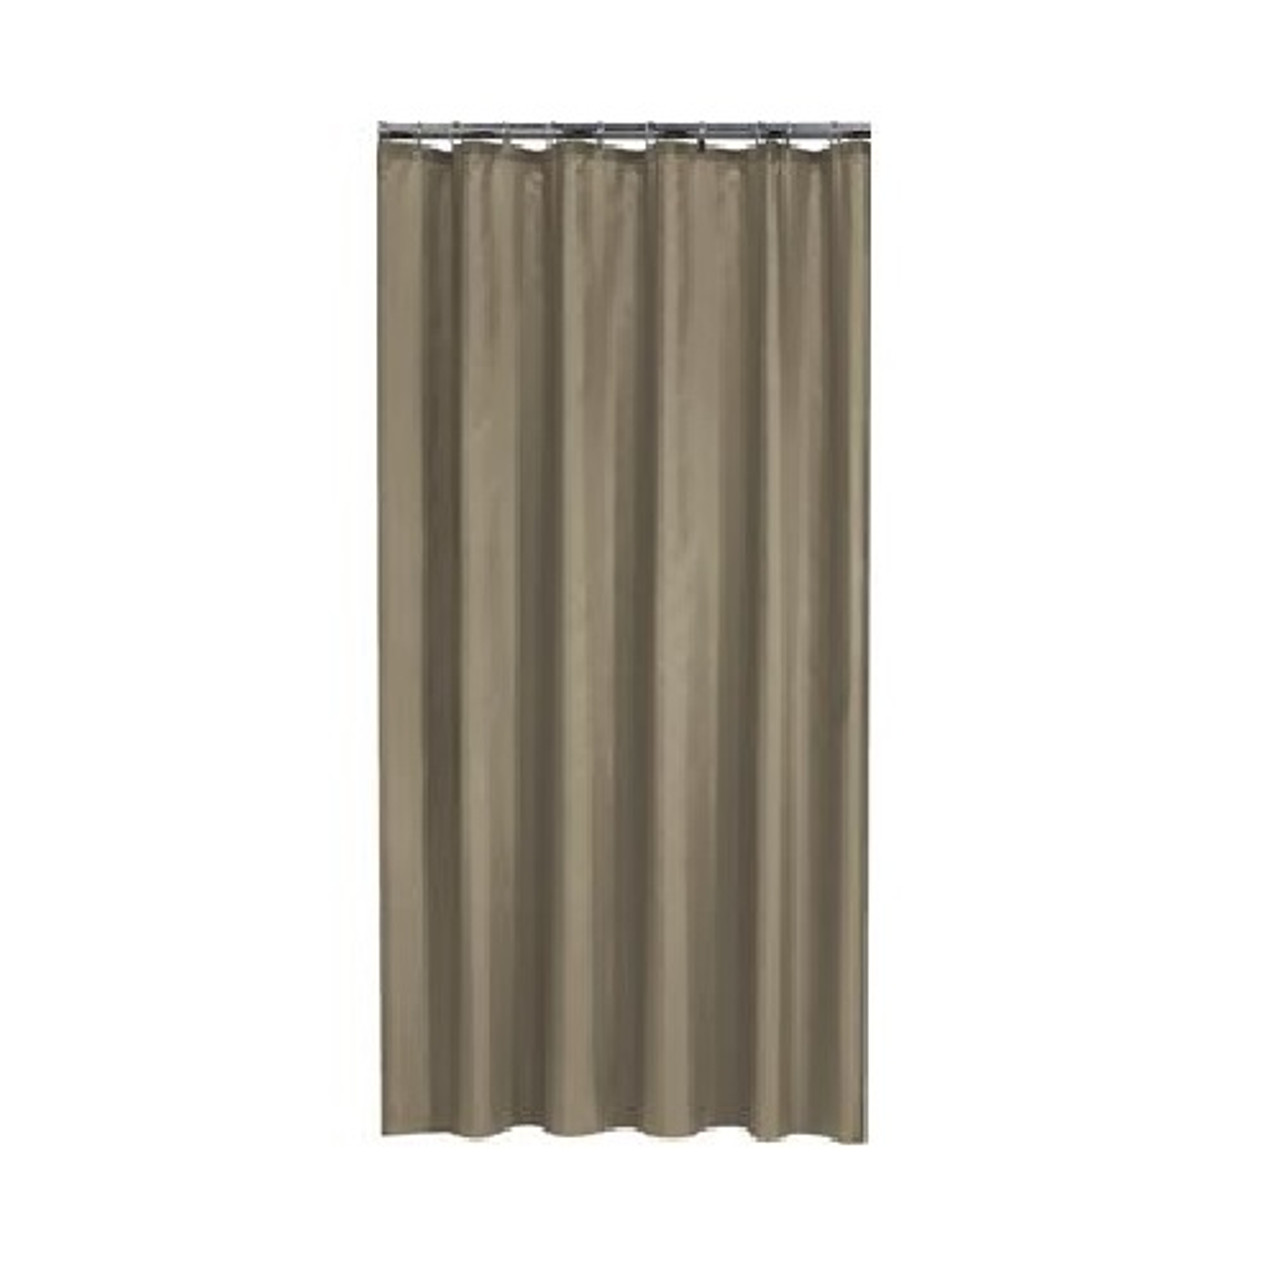 extra long shower curtain 72 x 78 inch gamma walnut brown fabric